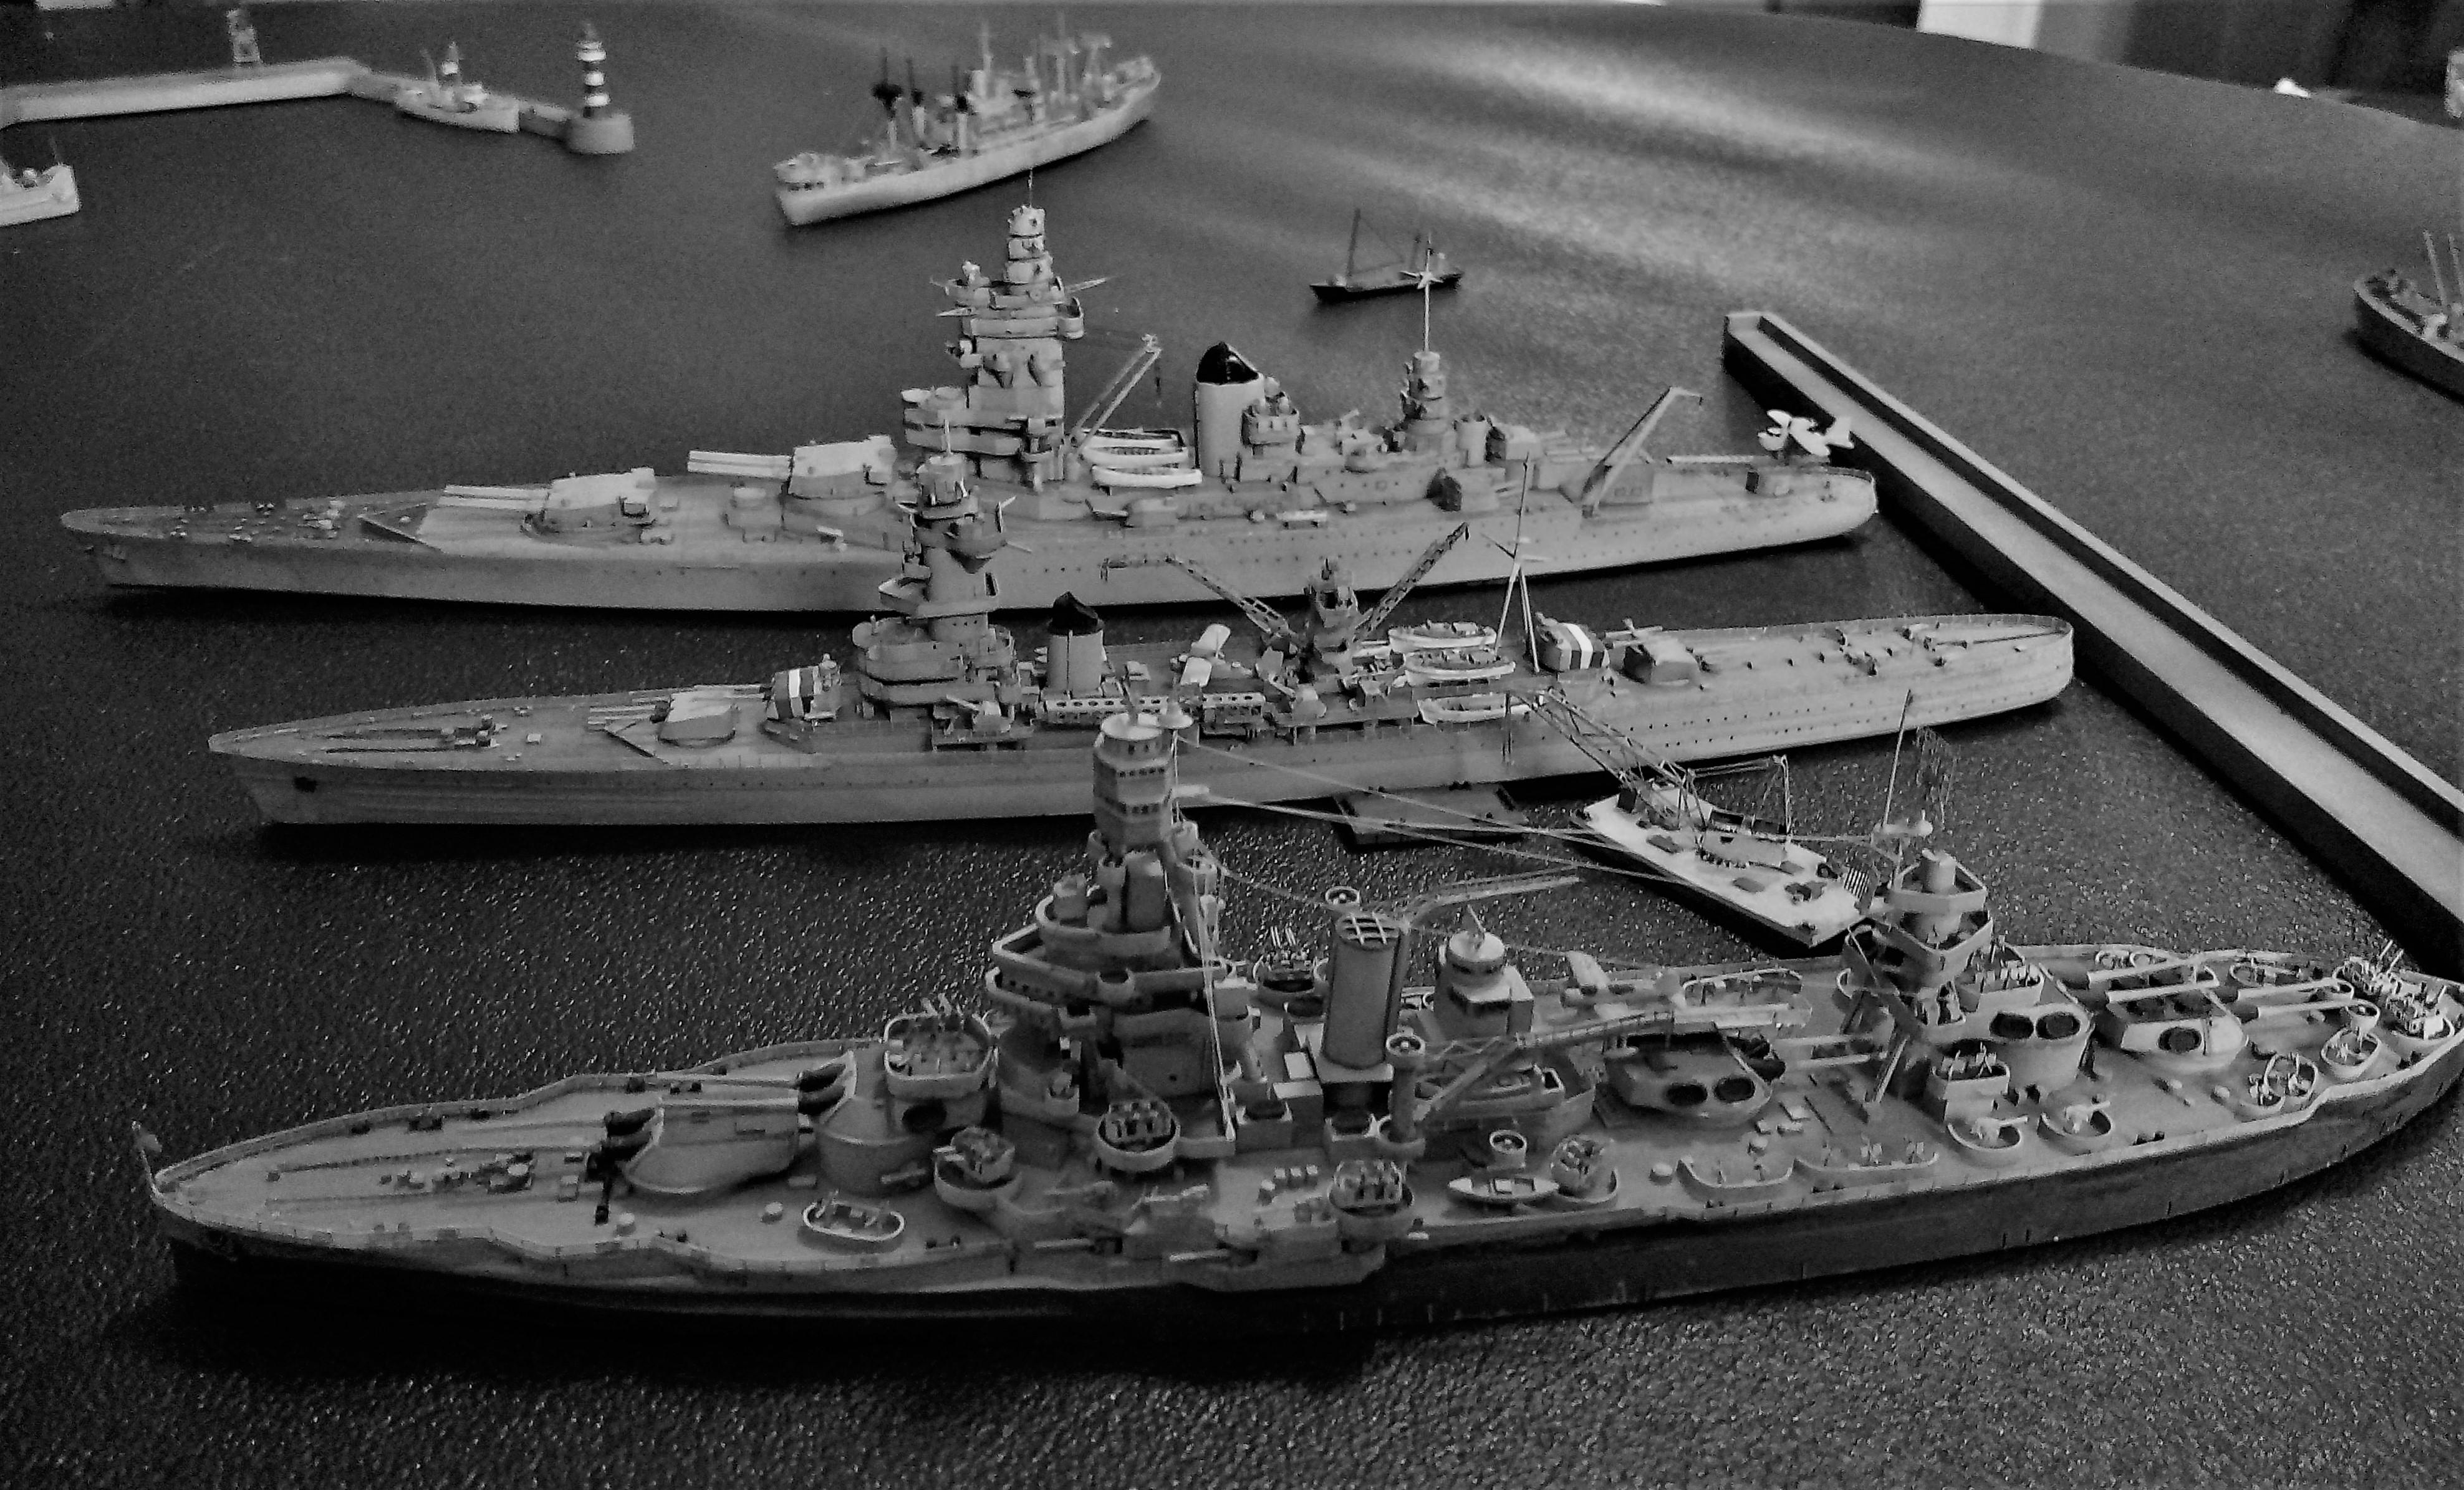 Diorama base navale 1/700 par Nesquik - Page 4 CgNKVuF68